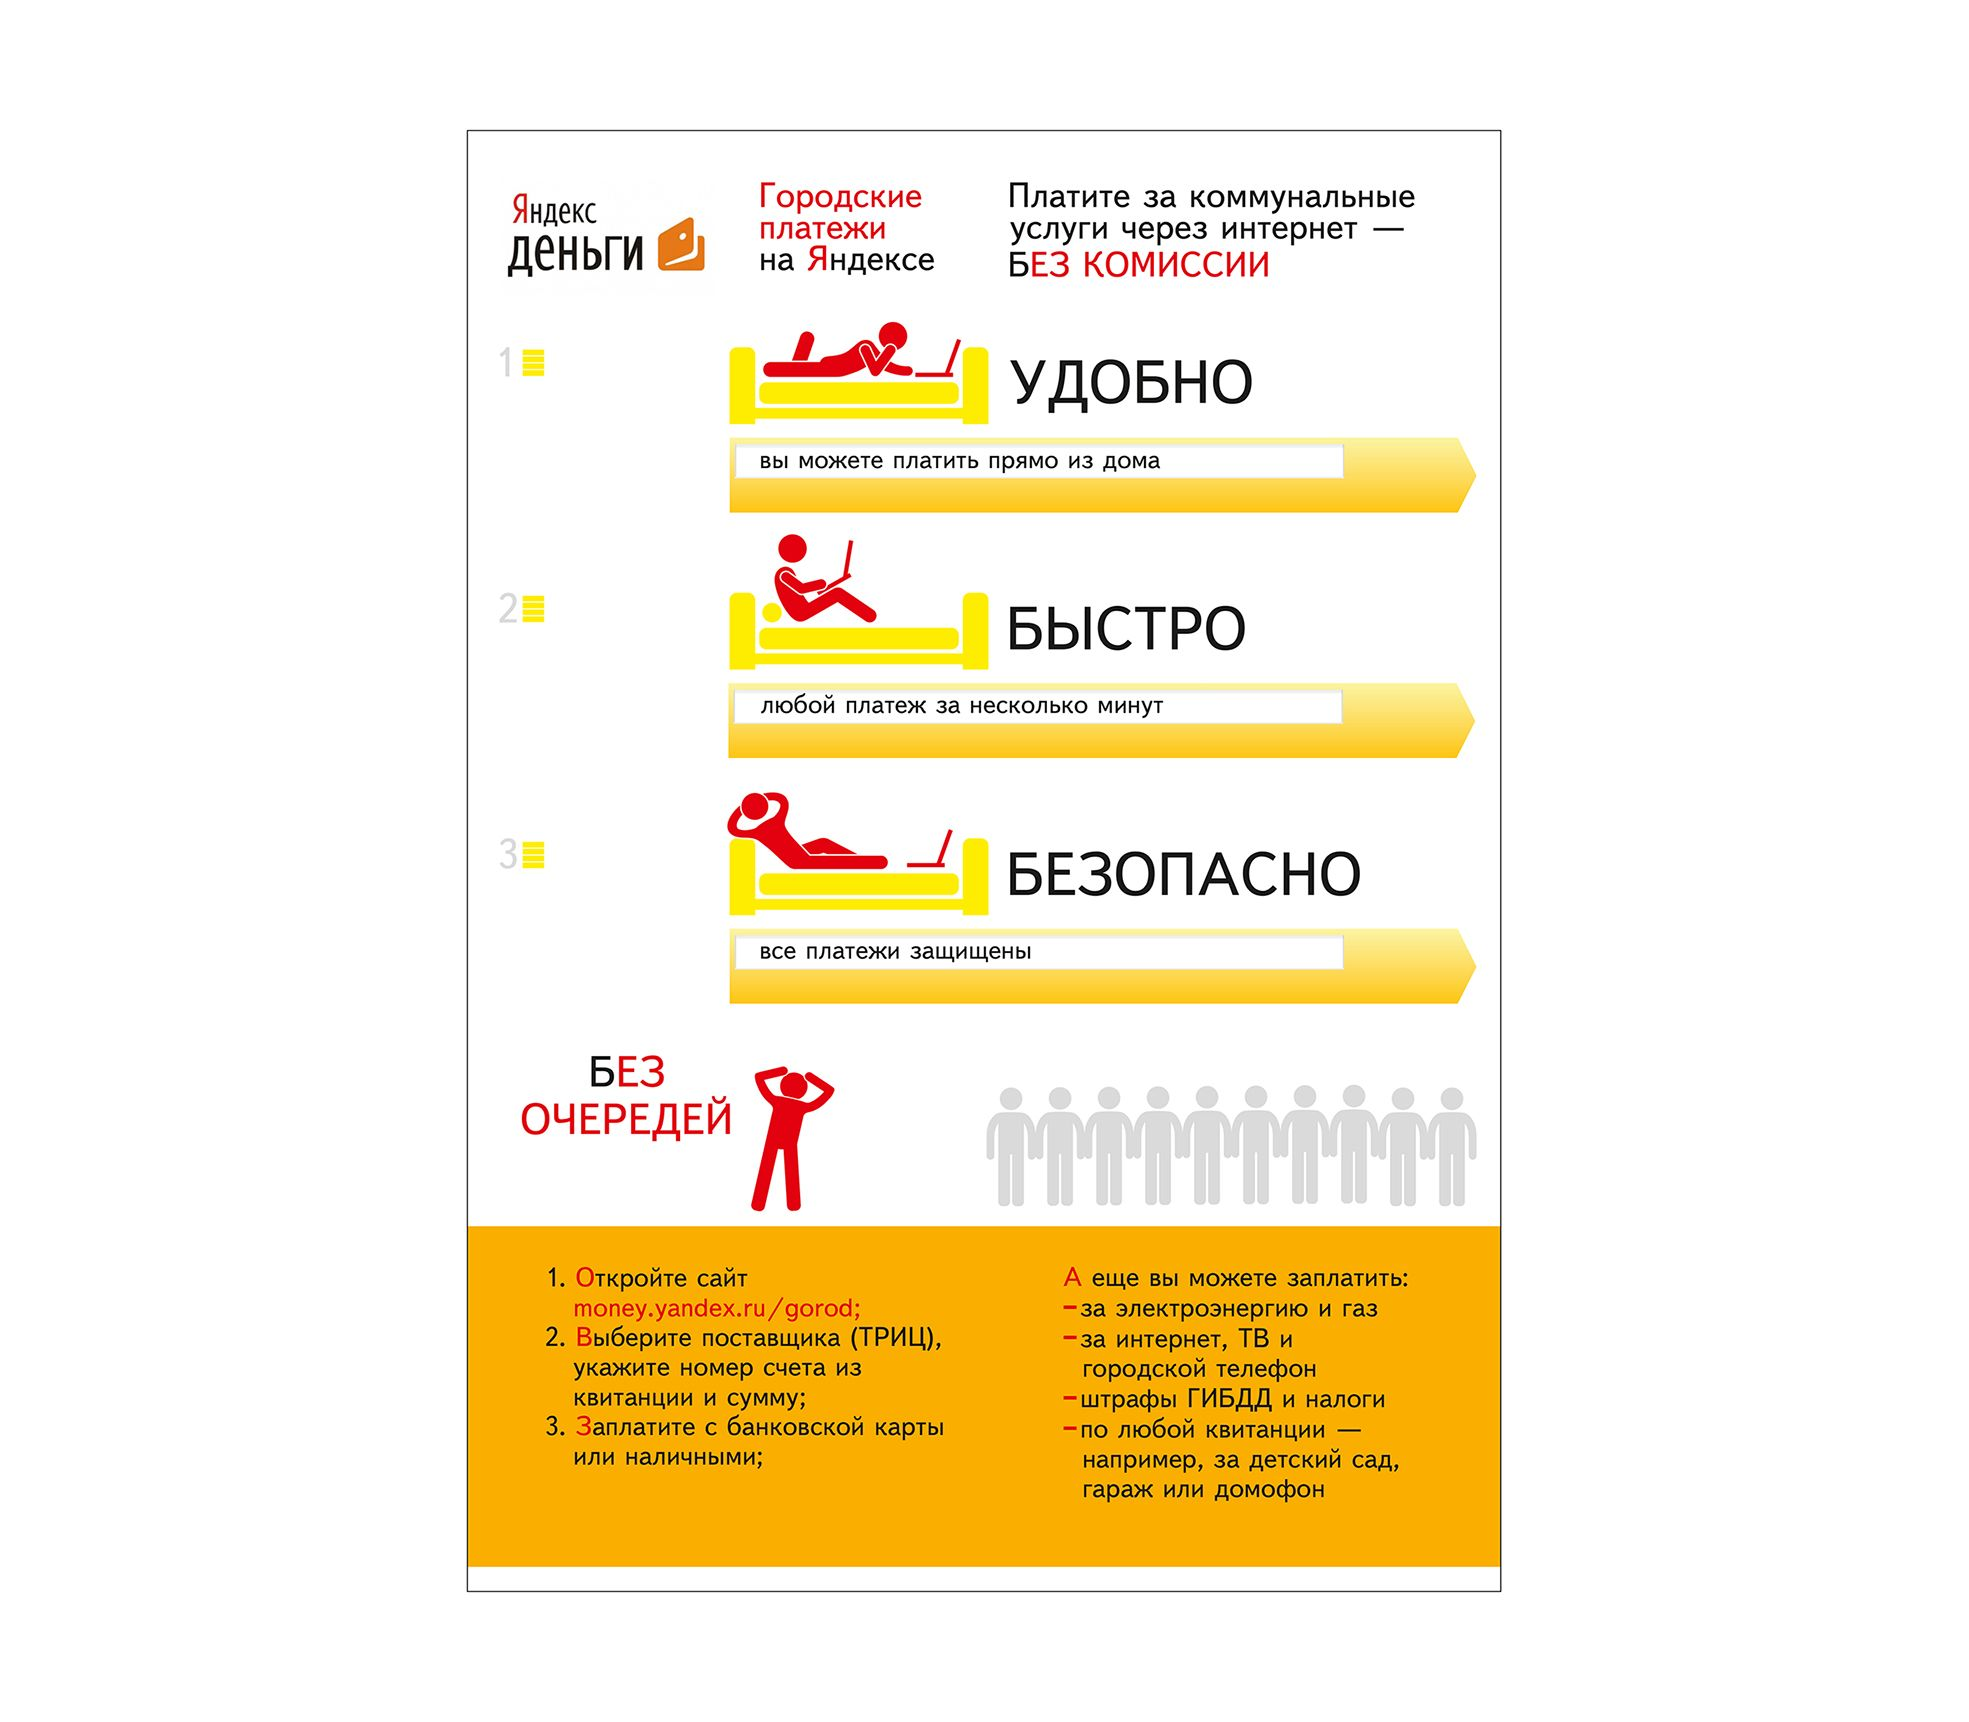 Реклама Яндекс.Денег для оплаты ЖКХ - дизайнер TokAlyona